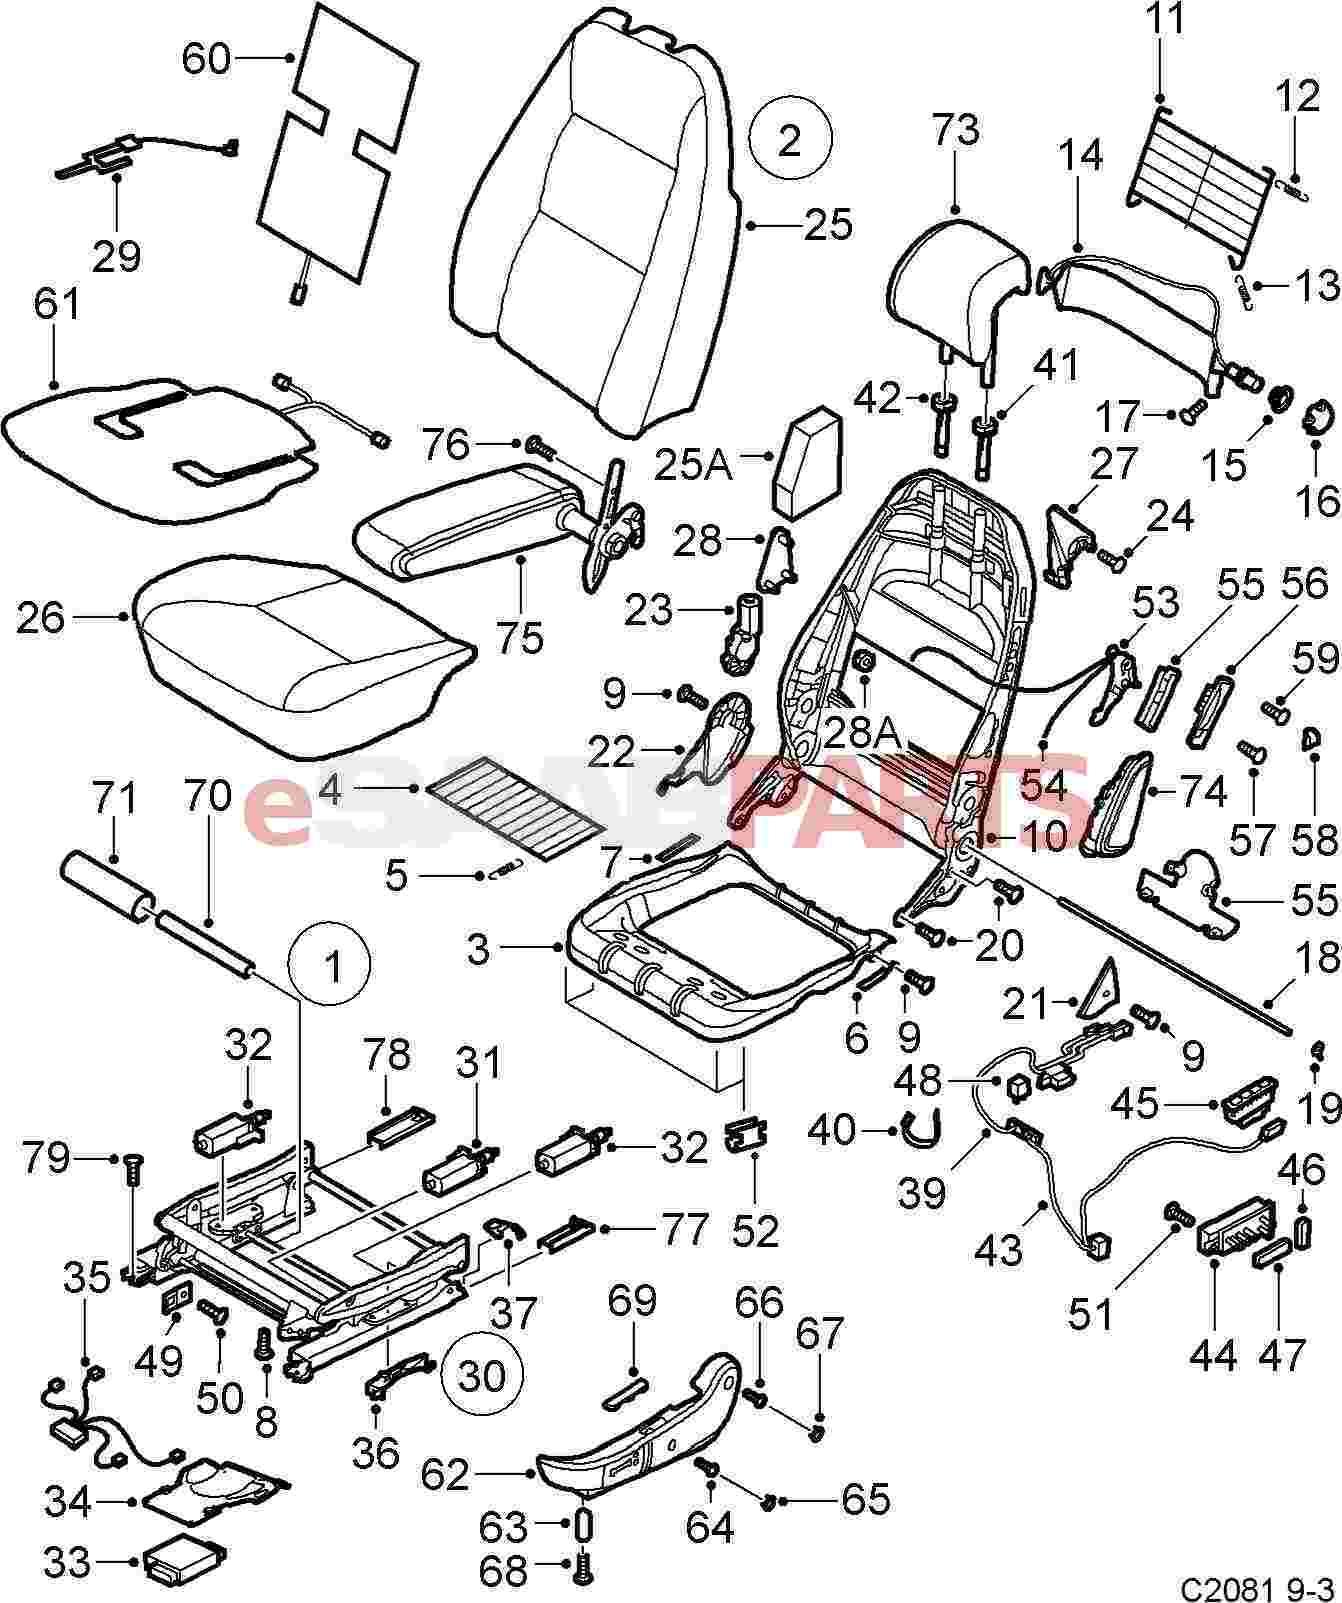 esaabparts saab 9 3 9400 car body internal parts seat Crane Wiring Diagram esaabparts saab 9 3 9400 car body internal parts seat assembly front electrical front seats